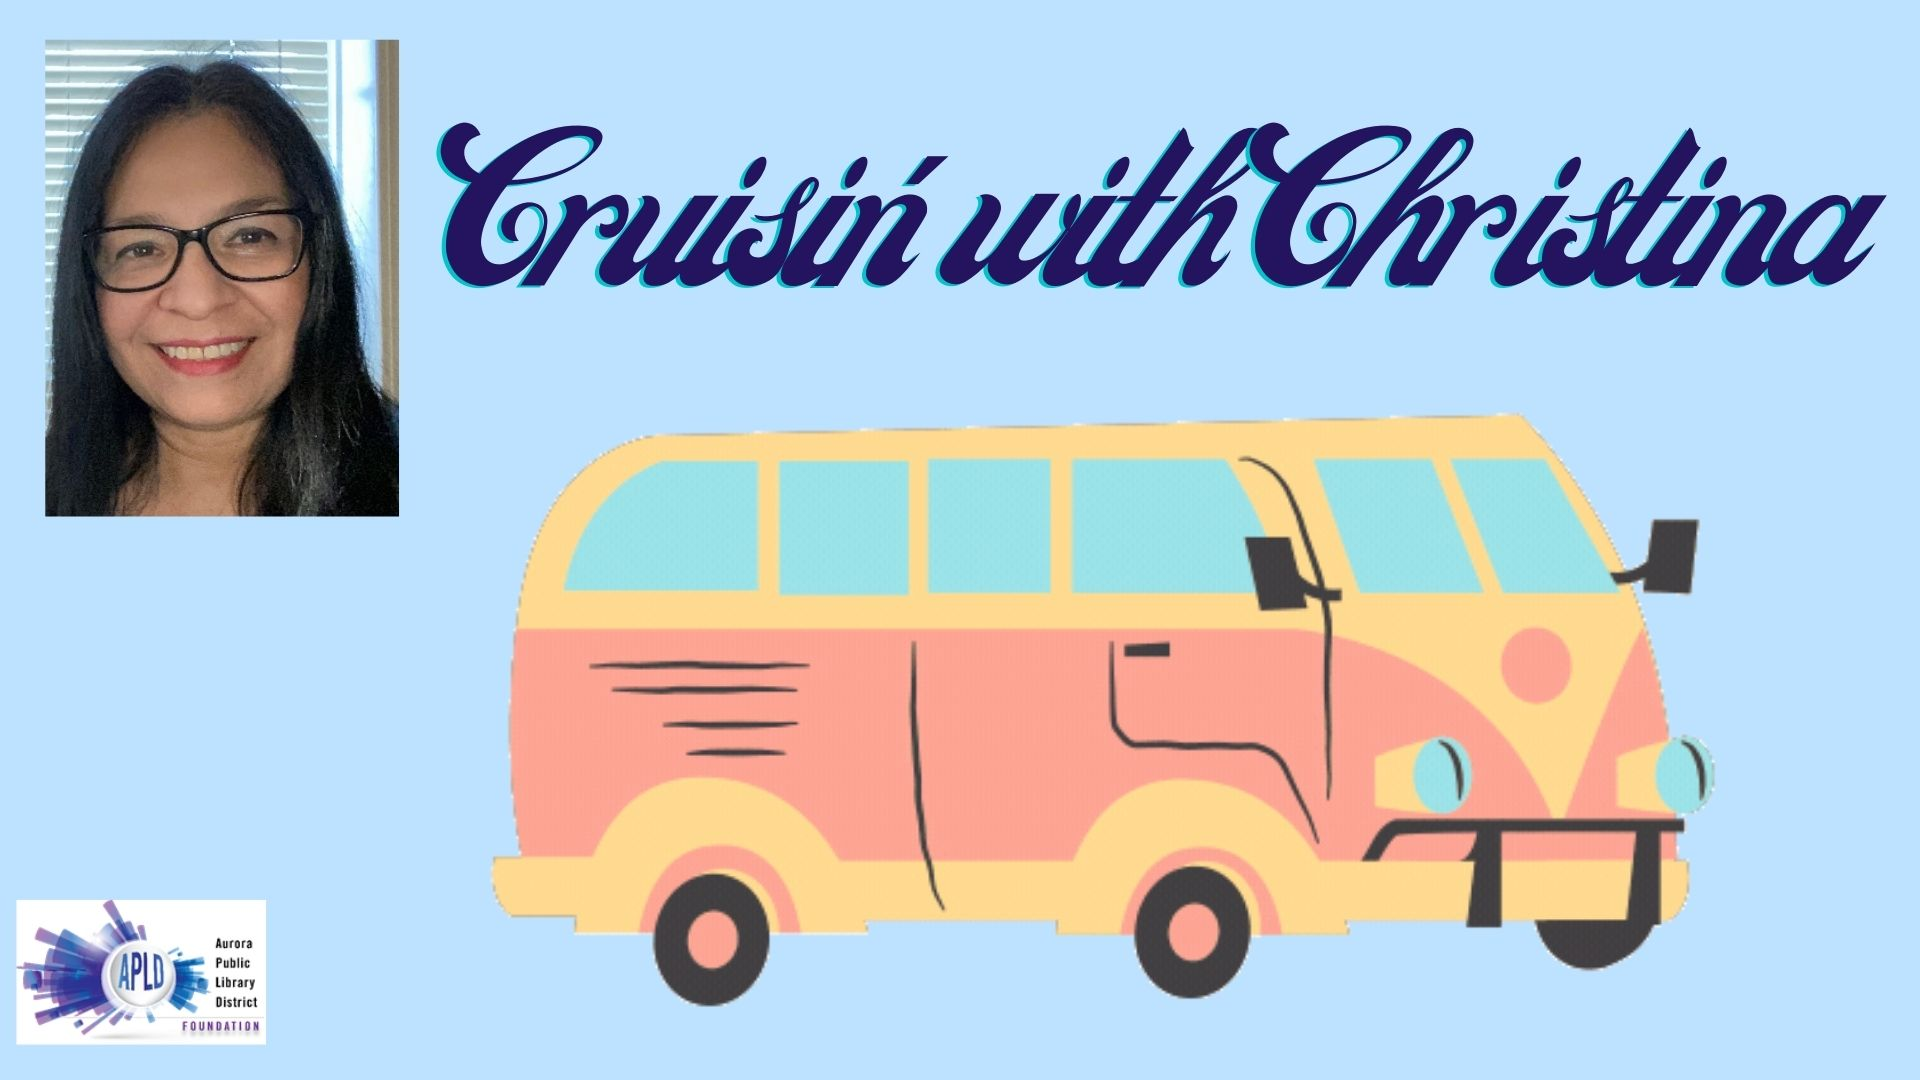 Cruisin' With Christina